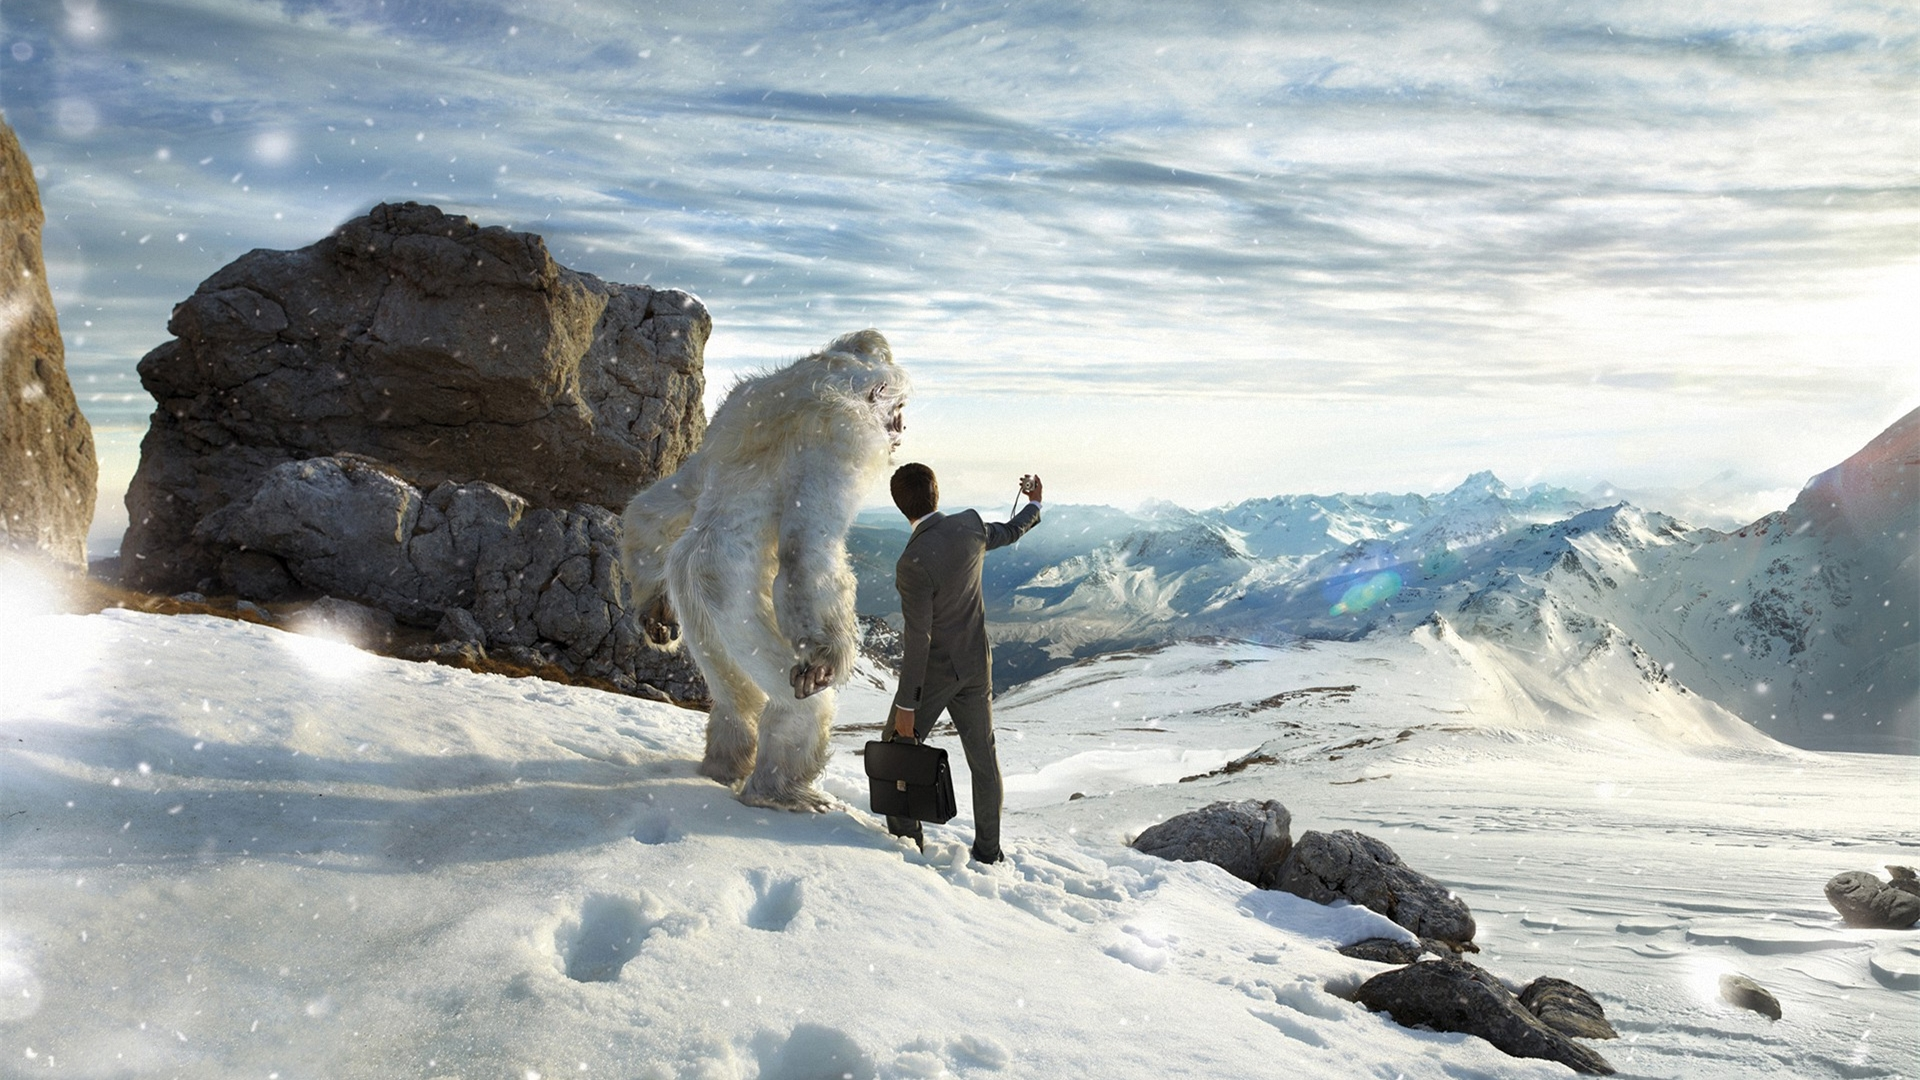 People 1920x1080 Photoshop photo manipulation animals nature humor selfies Yeti snowing snow mountains